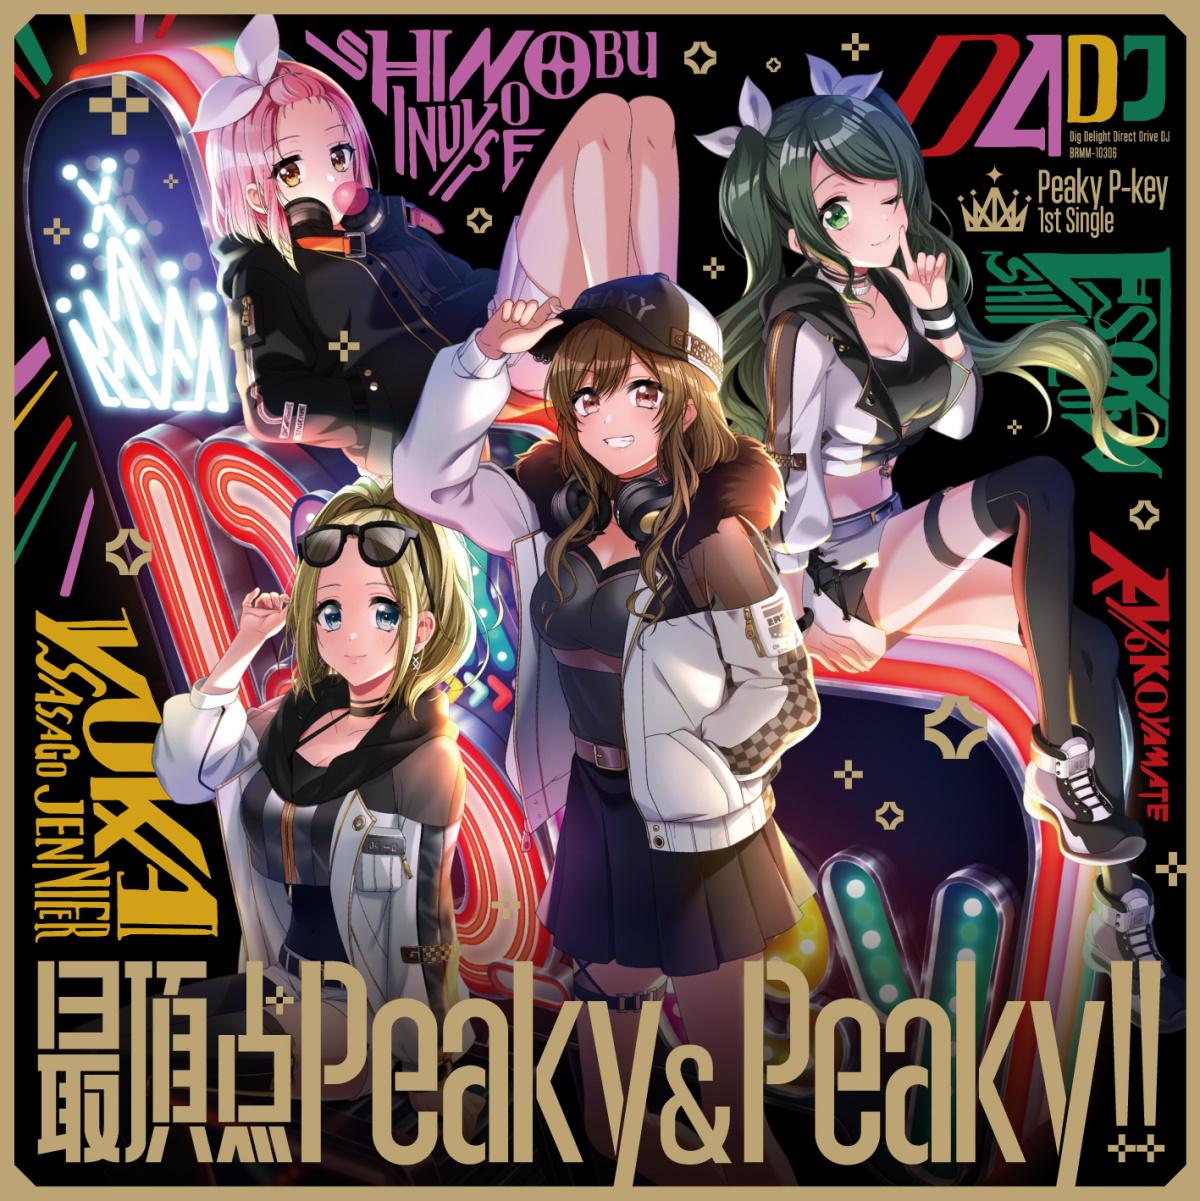 『Peaky P-key - Wish You Luck 歌詞』収録の『最頂点Peaky&Peaky!!』ジャケット